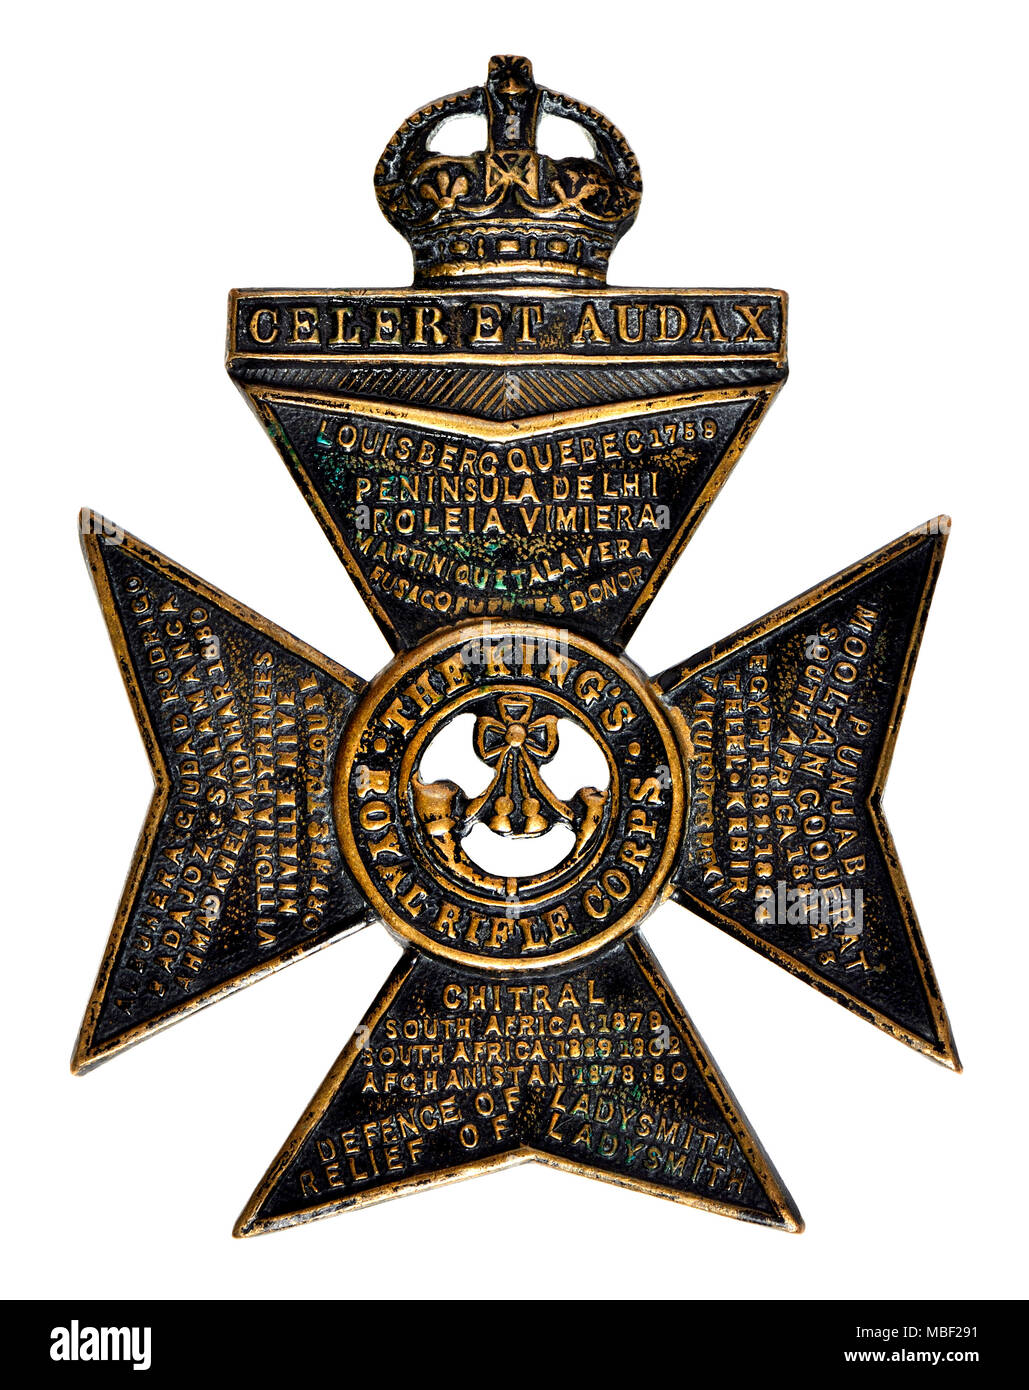 King's Royal Rifle Corps First World War cap badge - Stock Image